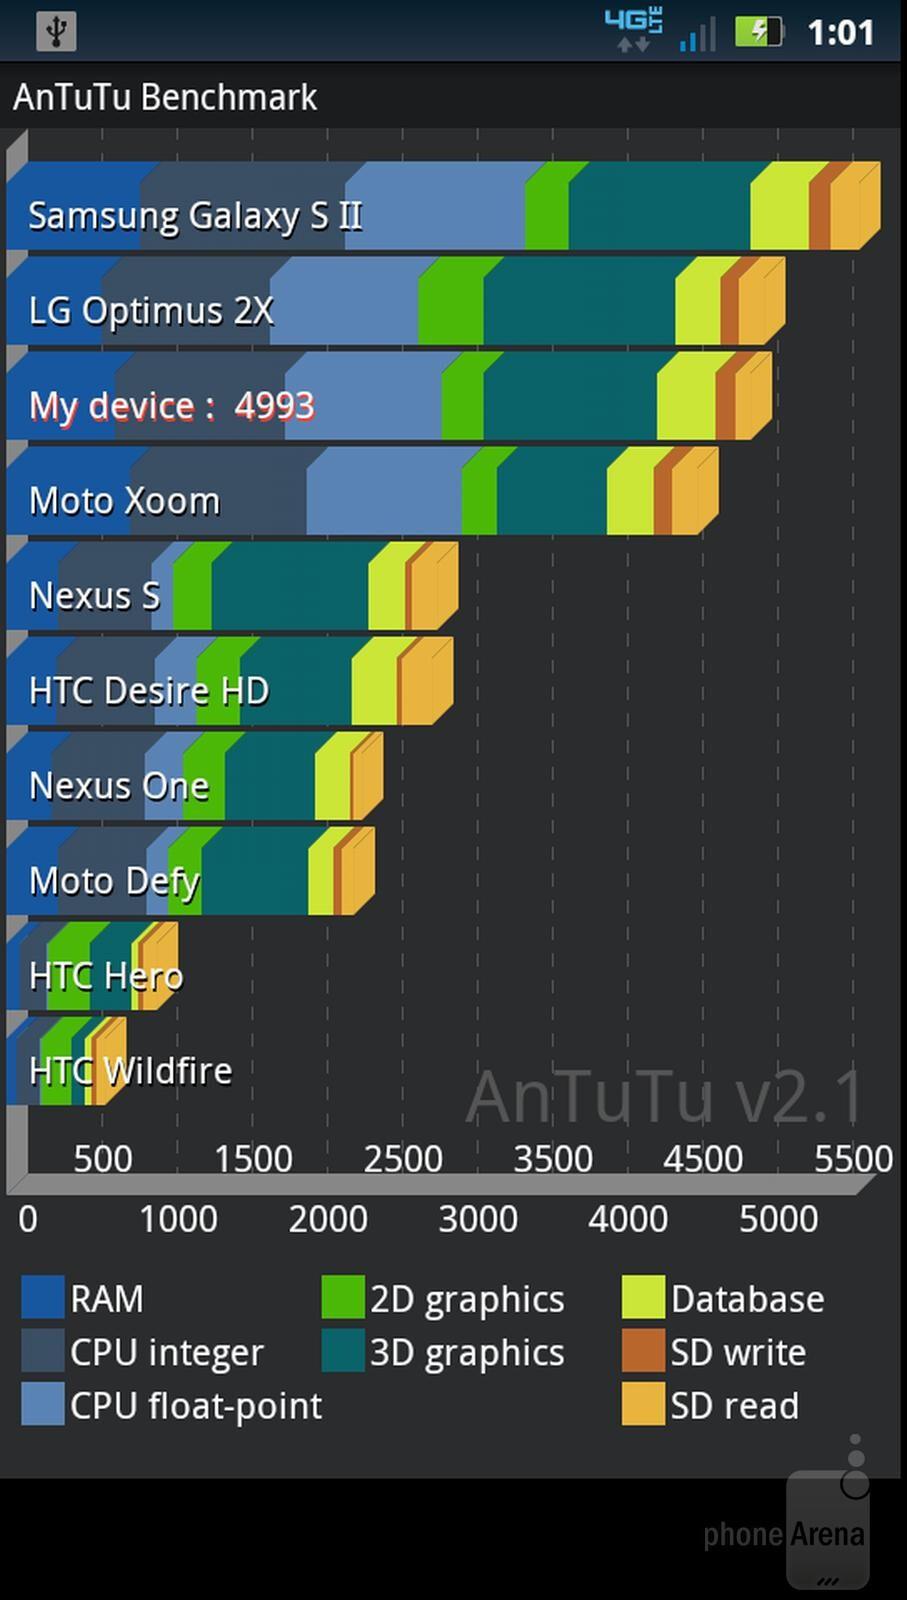 AnTutu Benchmark test - Benchmarking the Motorola DROID BIONIC